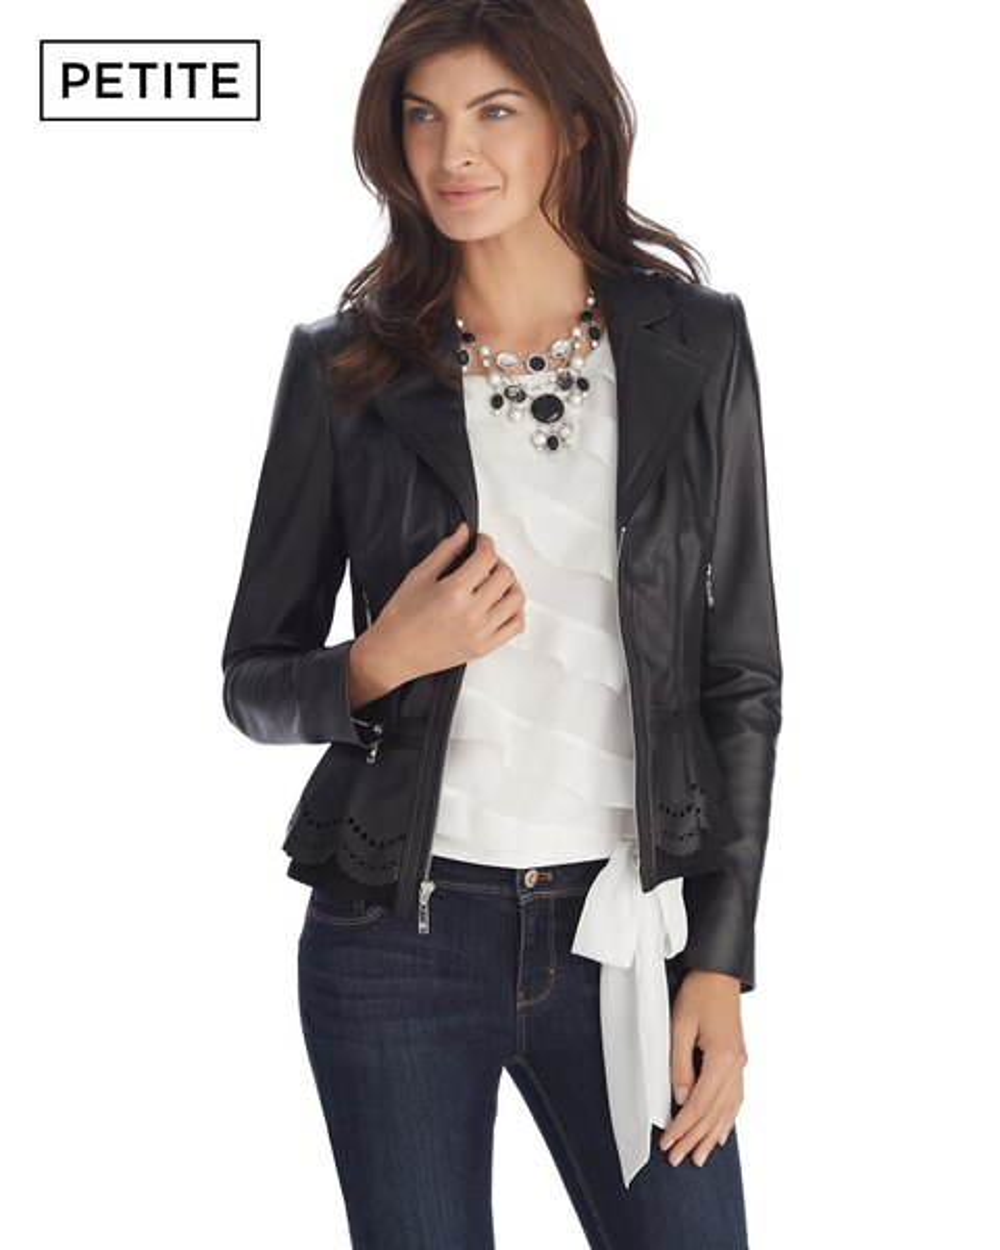 Petite Leather Ponte Black Peplum Jacket - WHBM